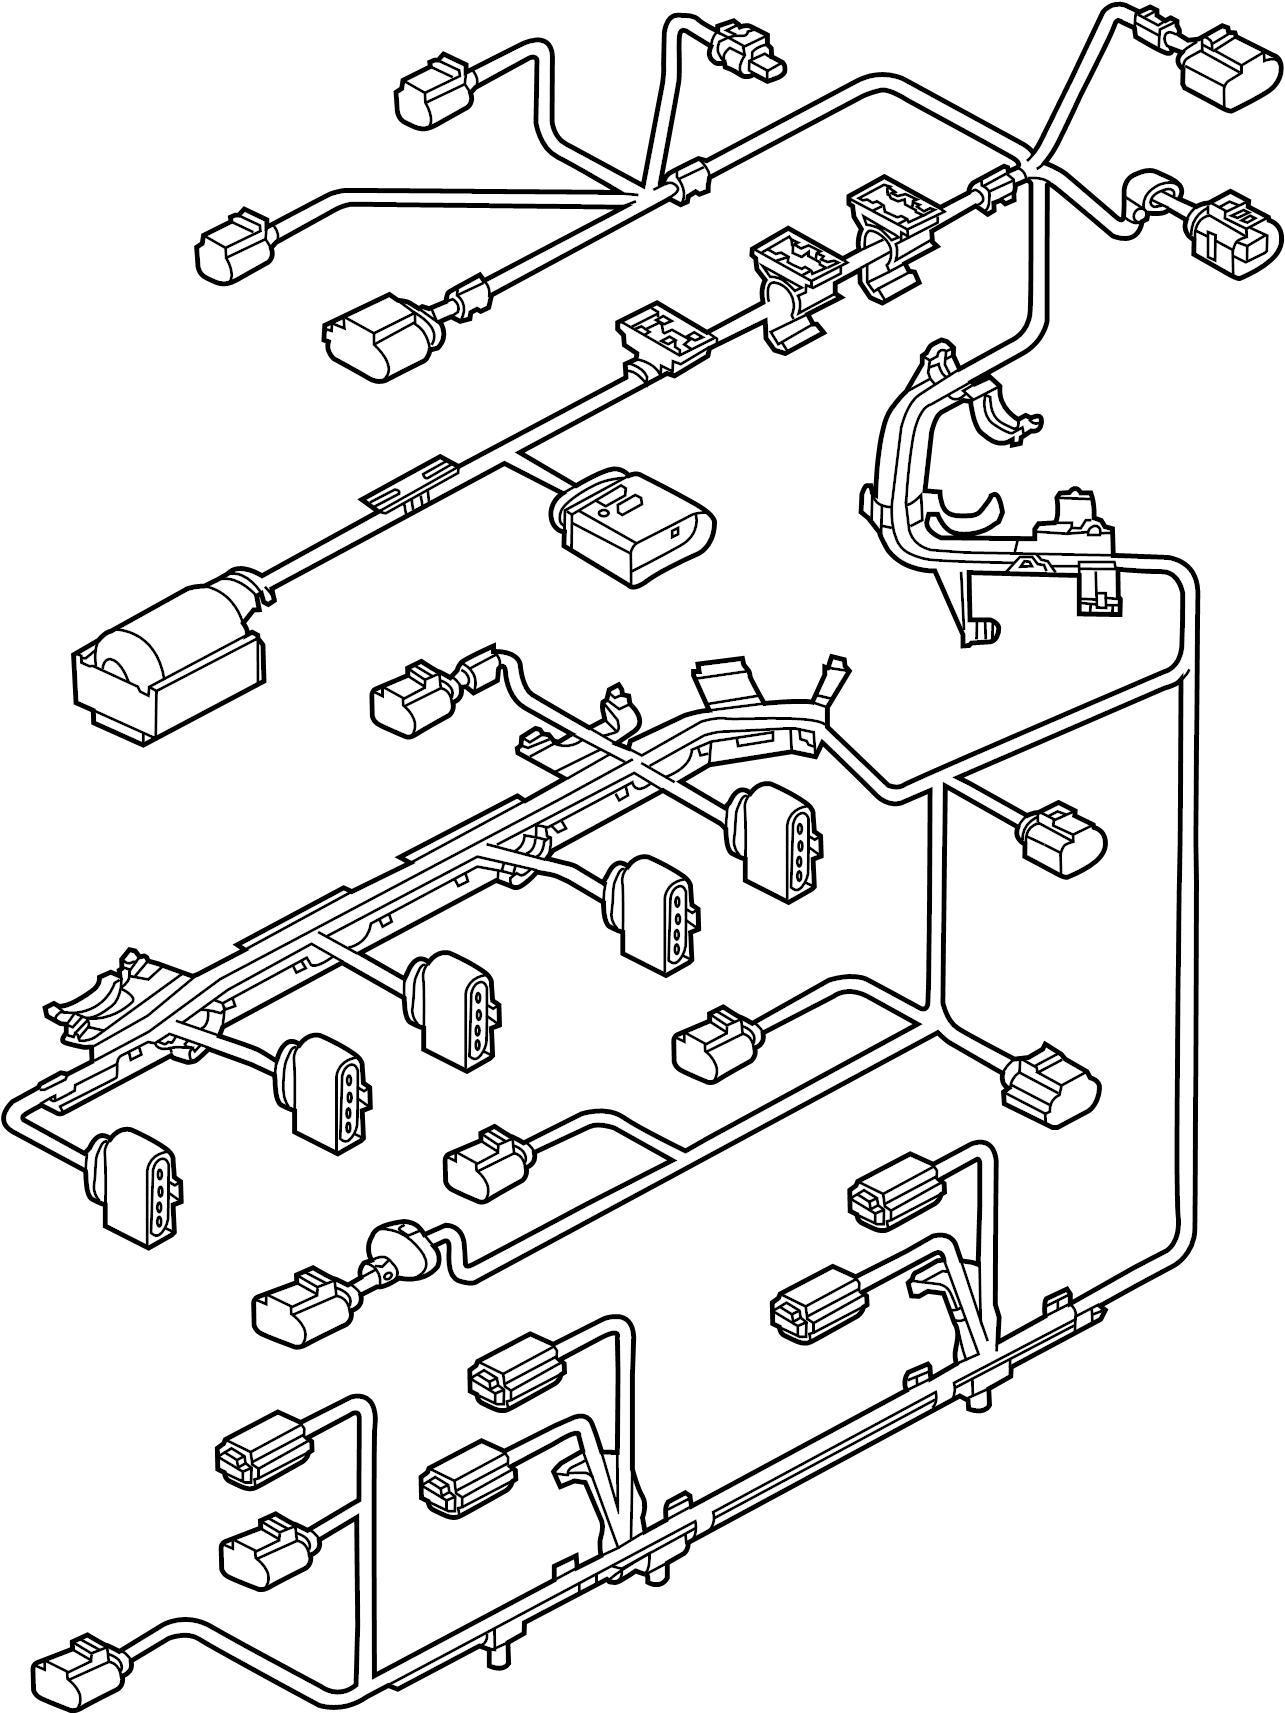 Volkswagen Beetle Engine Wiring Harness. 2.5 LITER, w